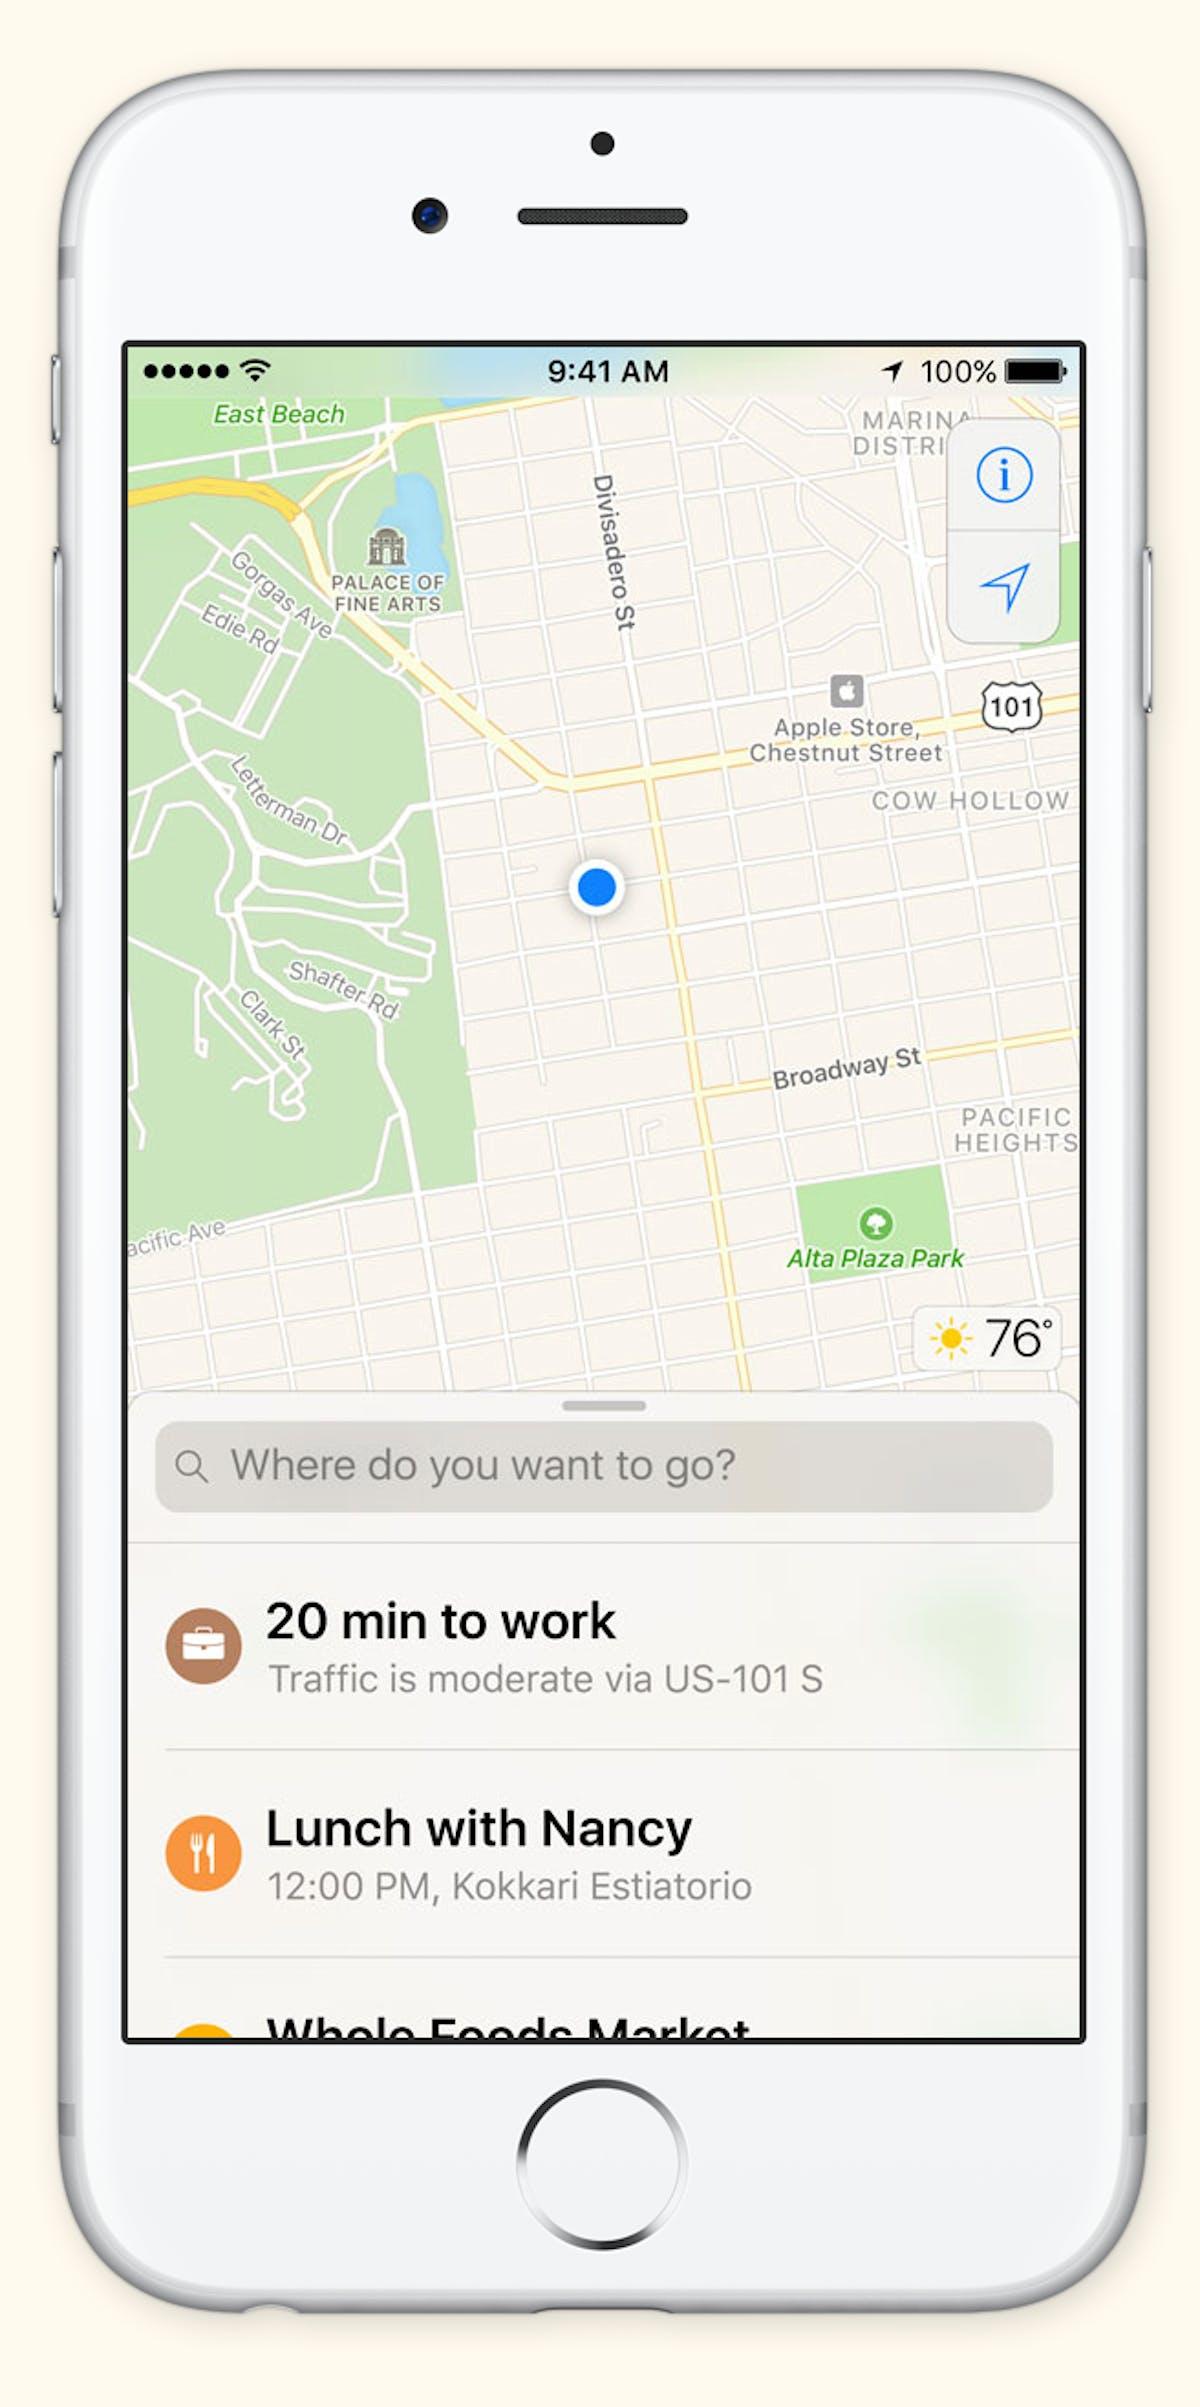 the new start screen in apple mapspngautoformatcompressw1200